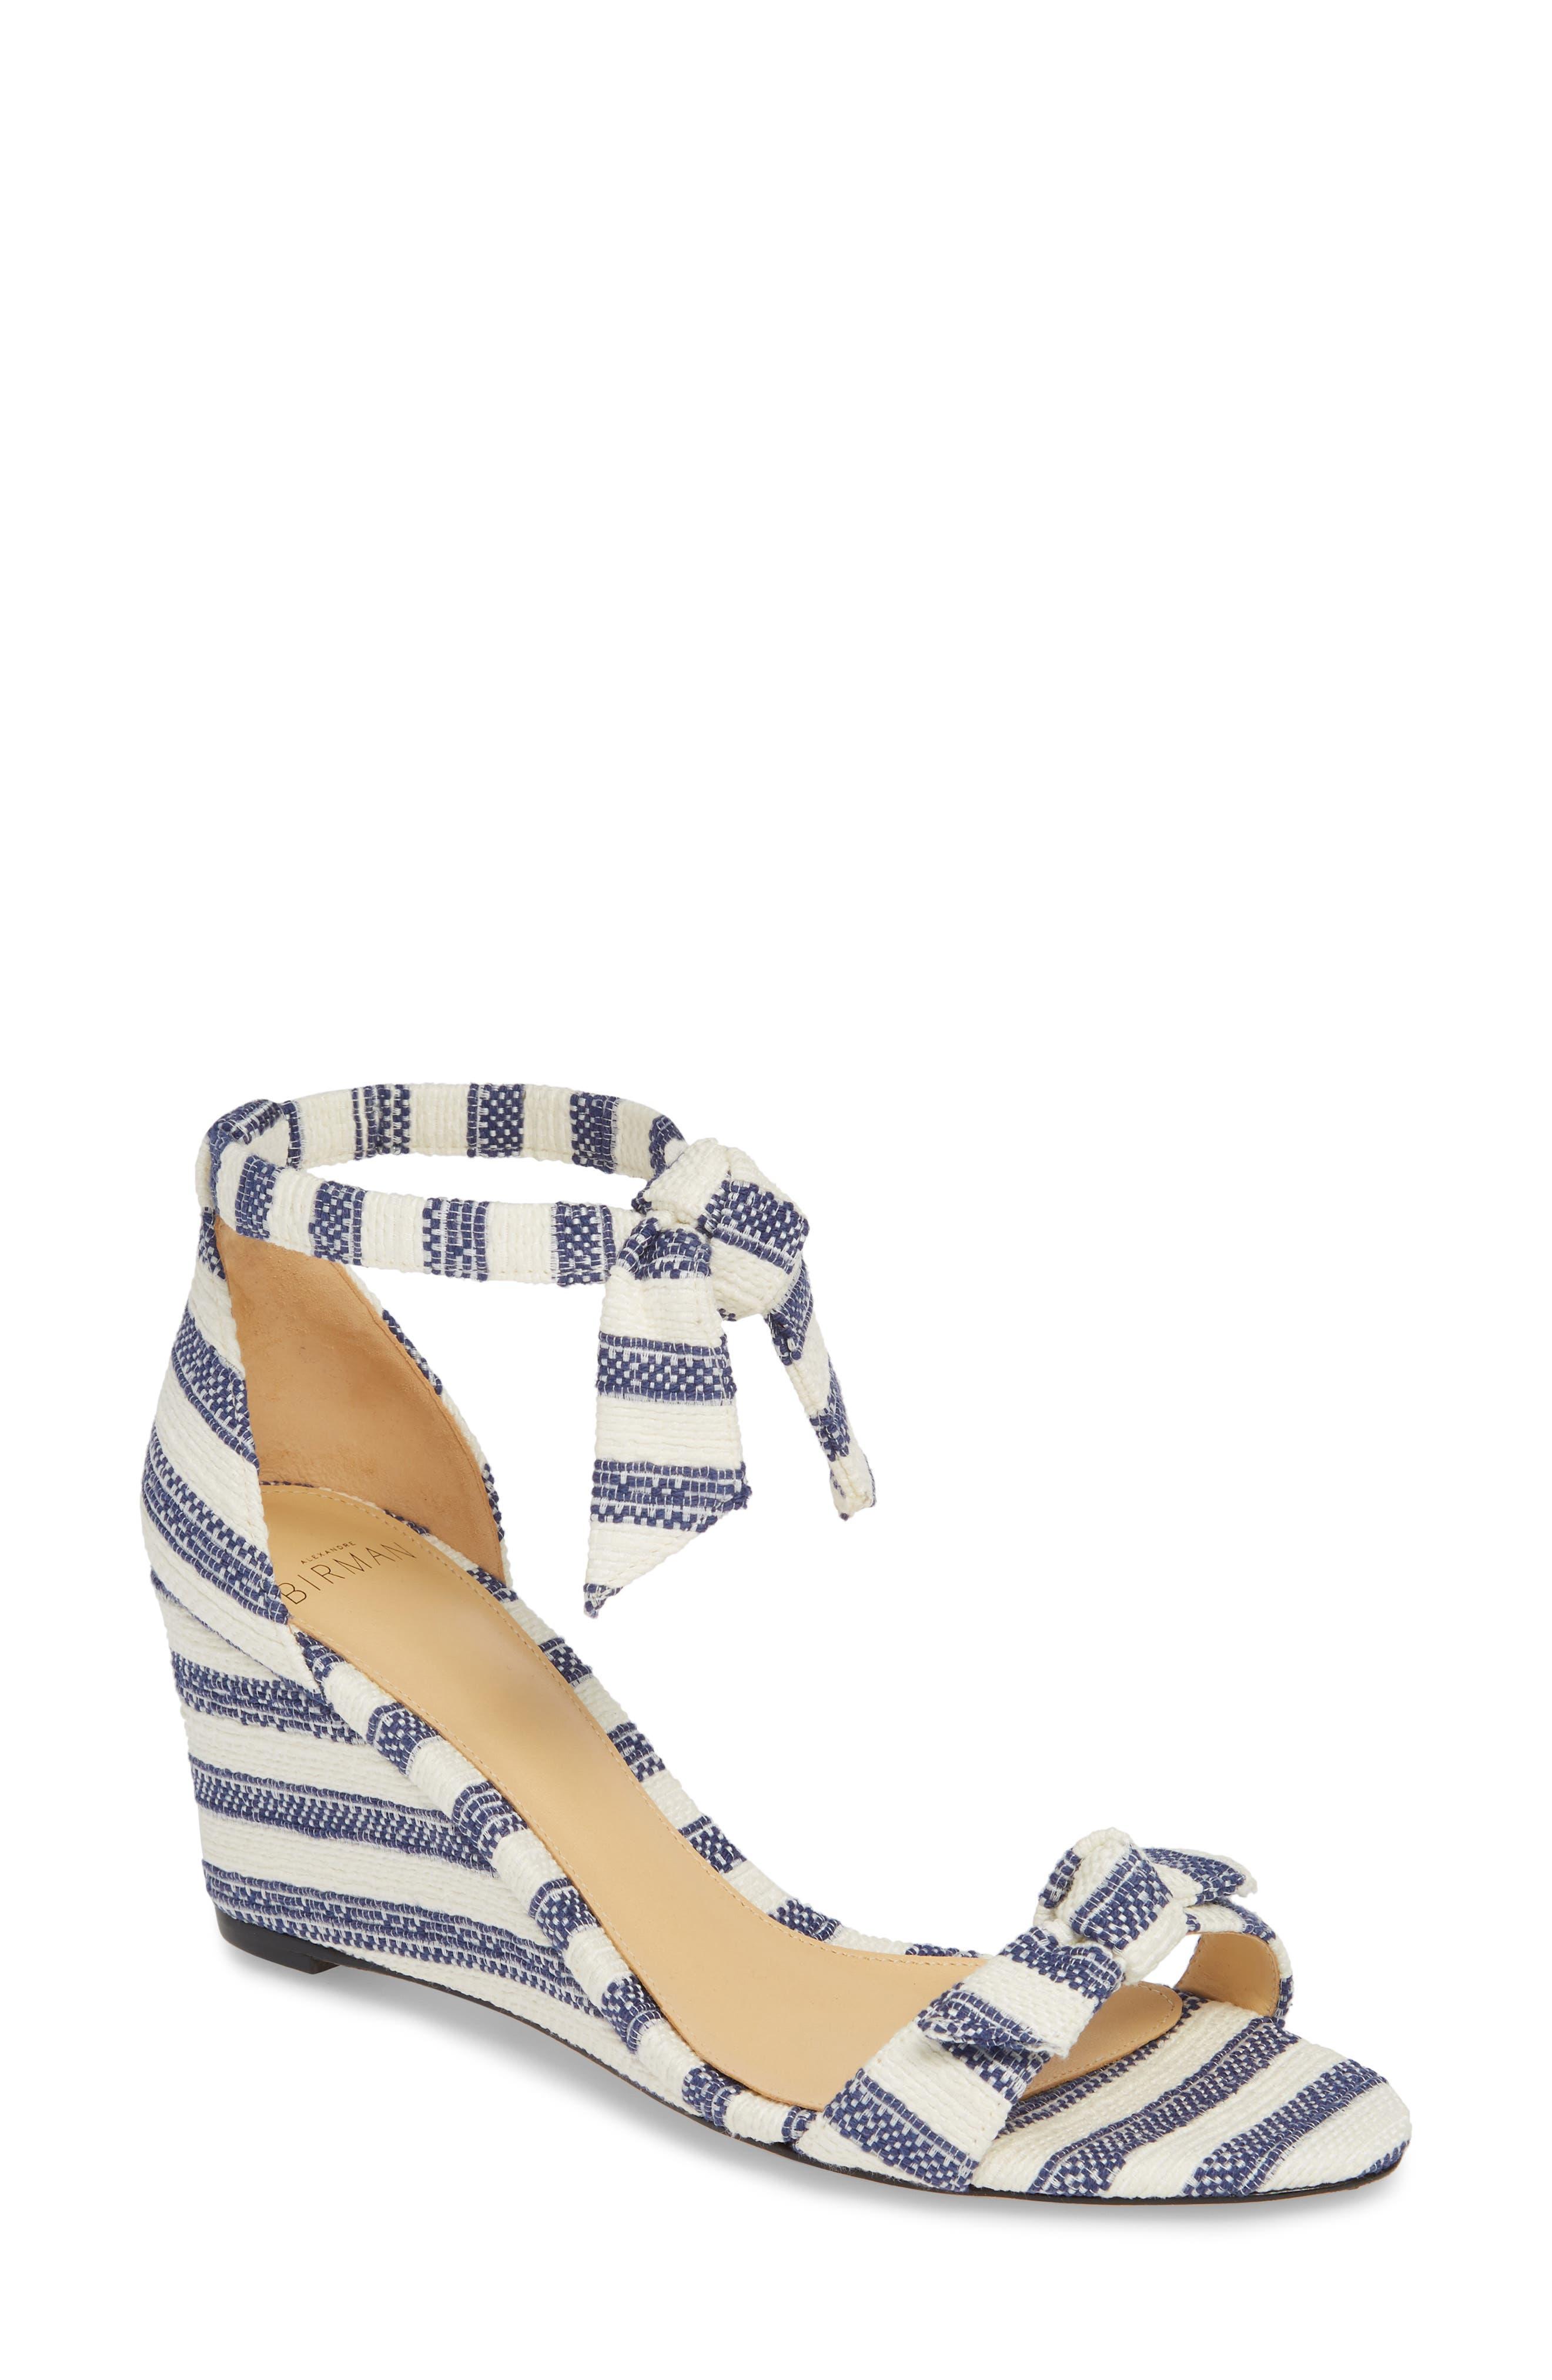 Alexandre Birman Clarita Wedge Sandal- Blue